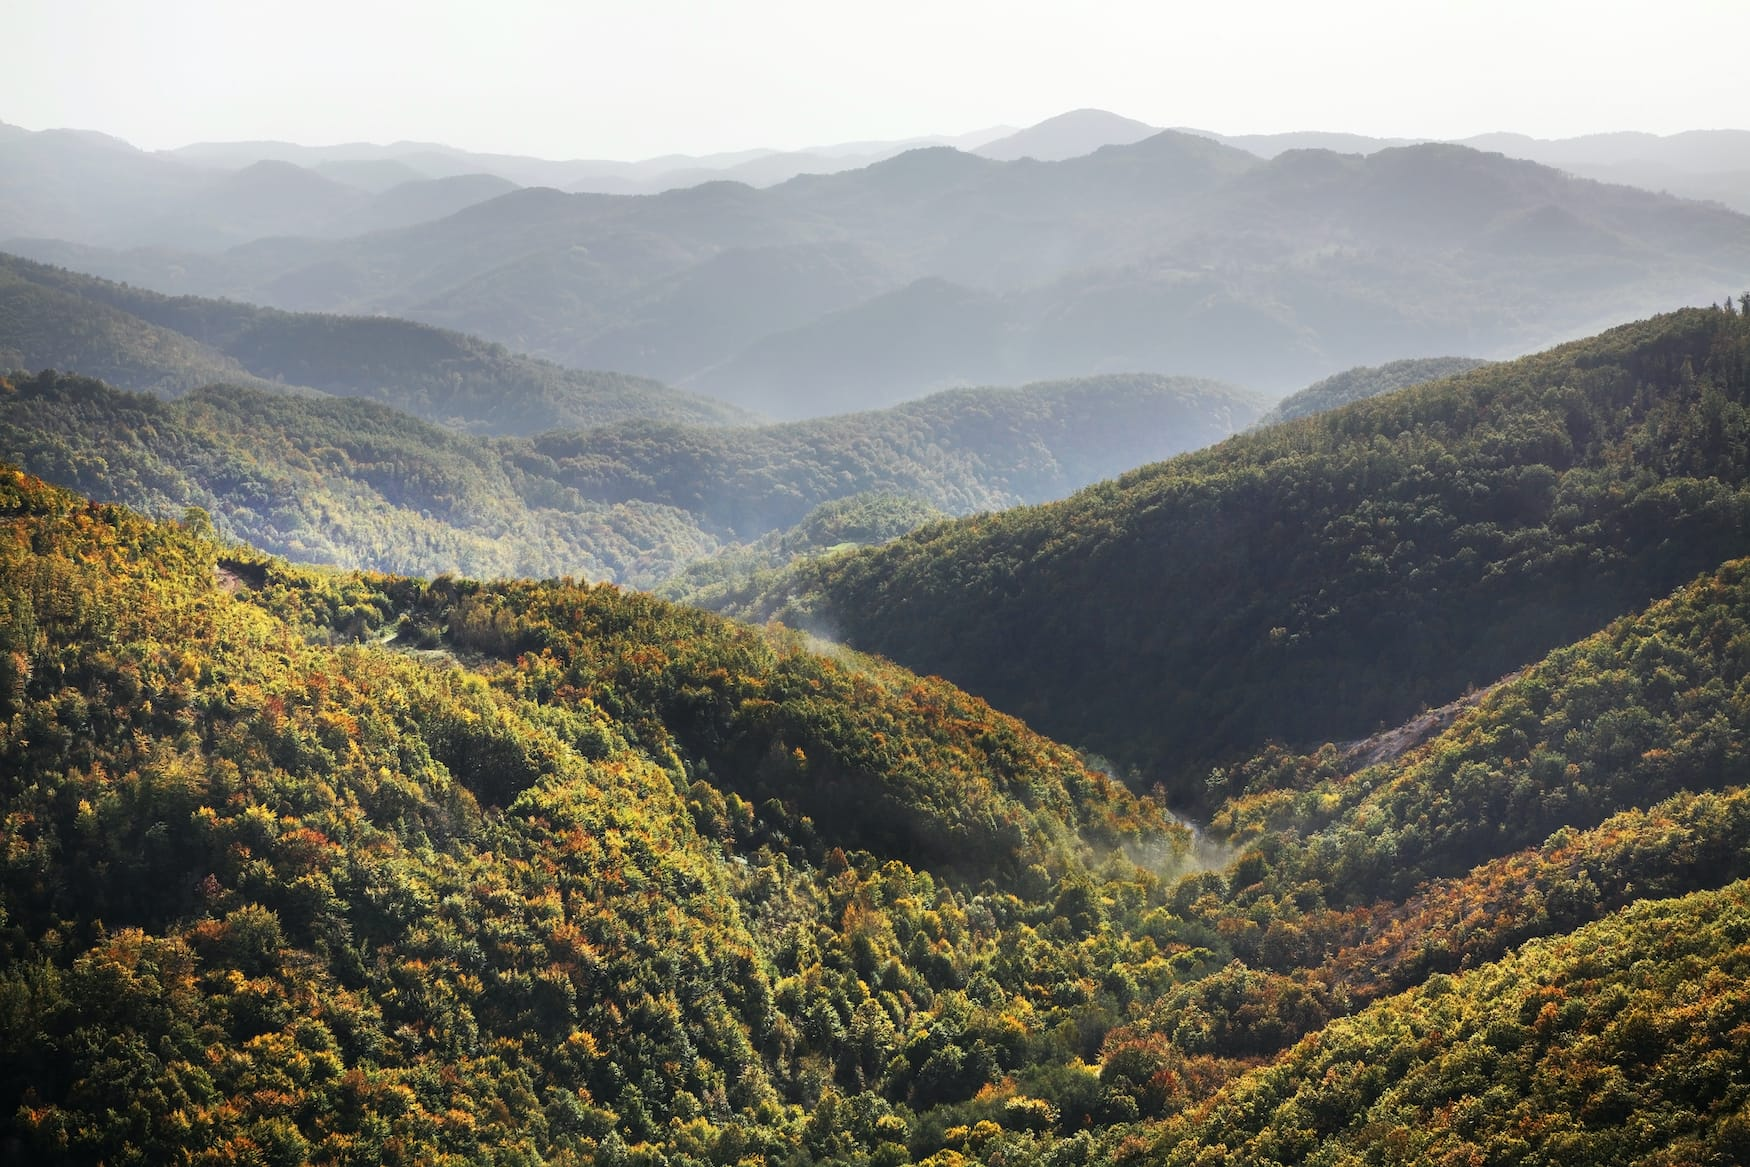 Vernebelter Blick aufs Radan-Gebirge iN Serbien